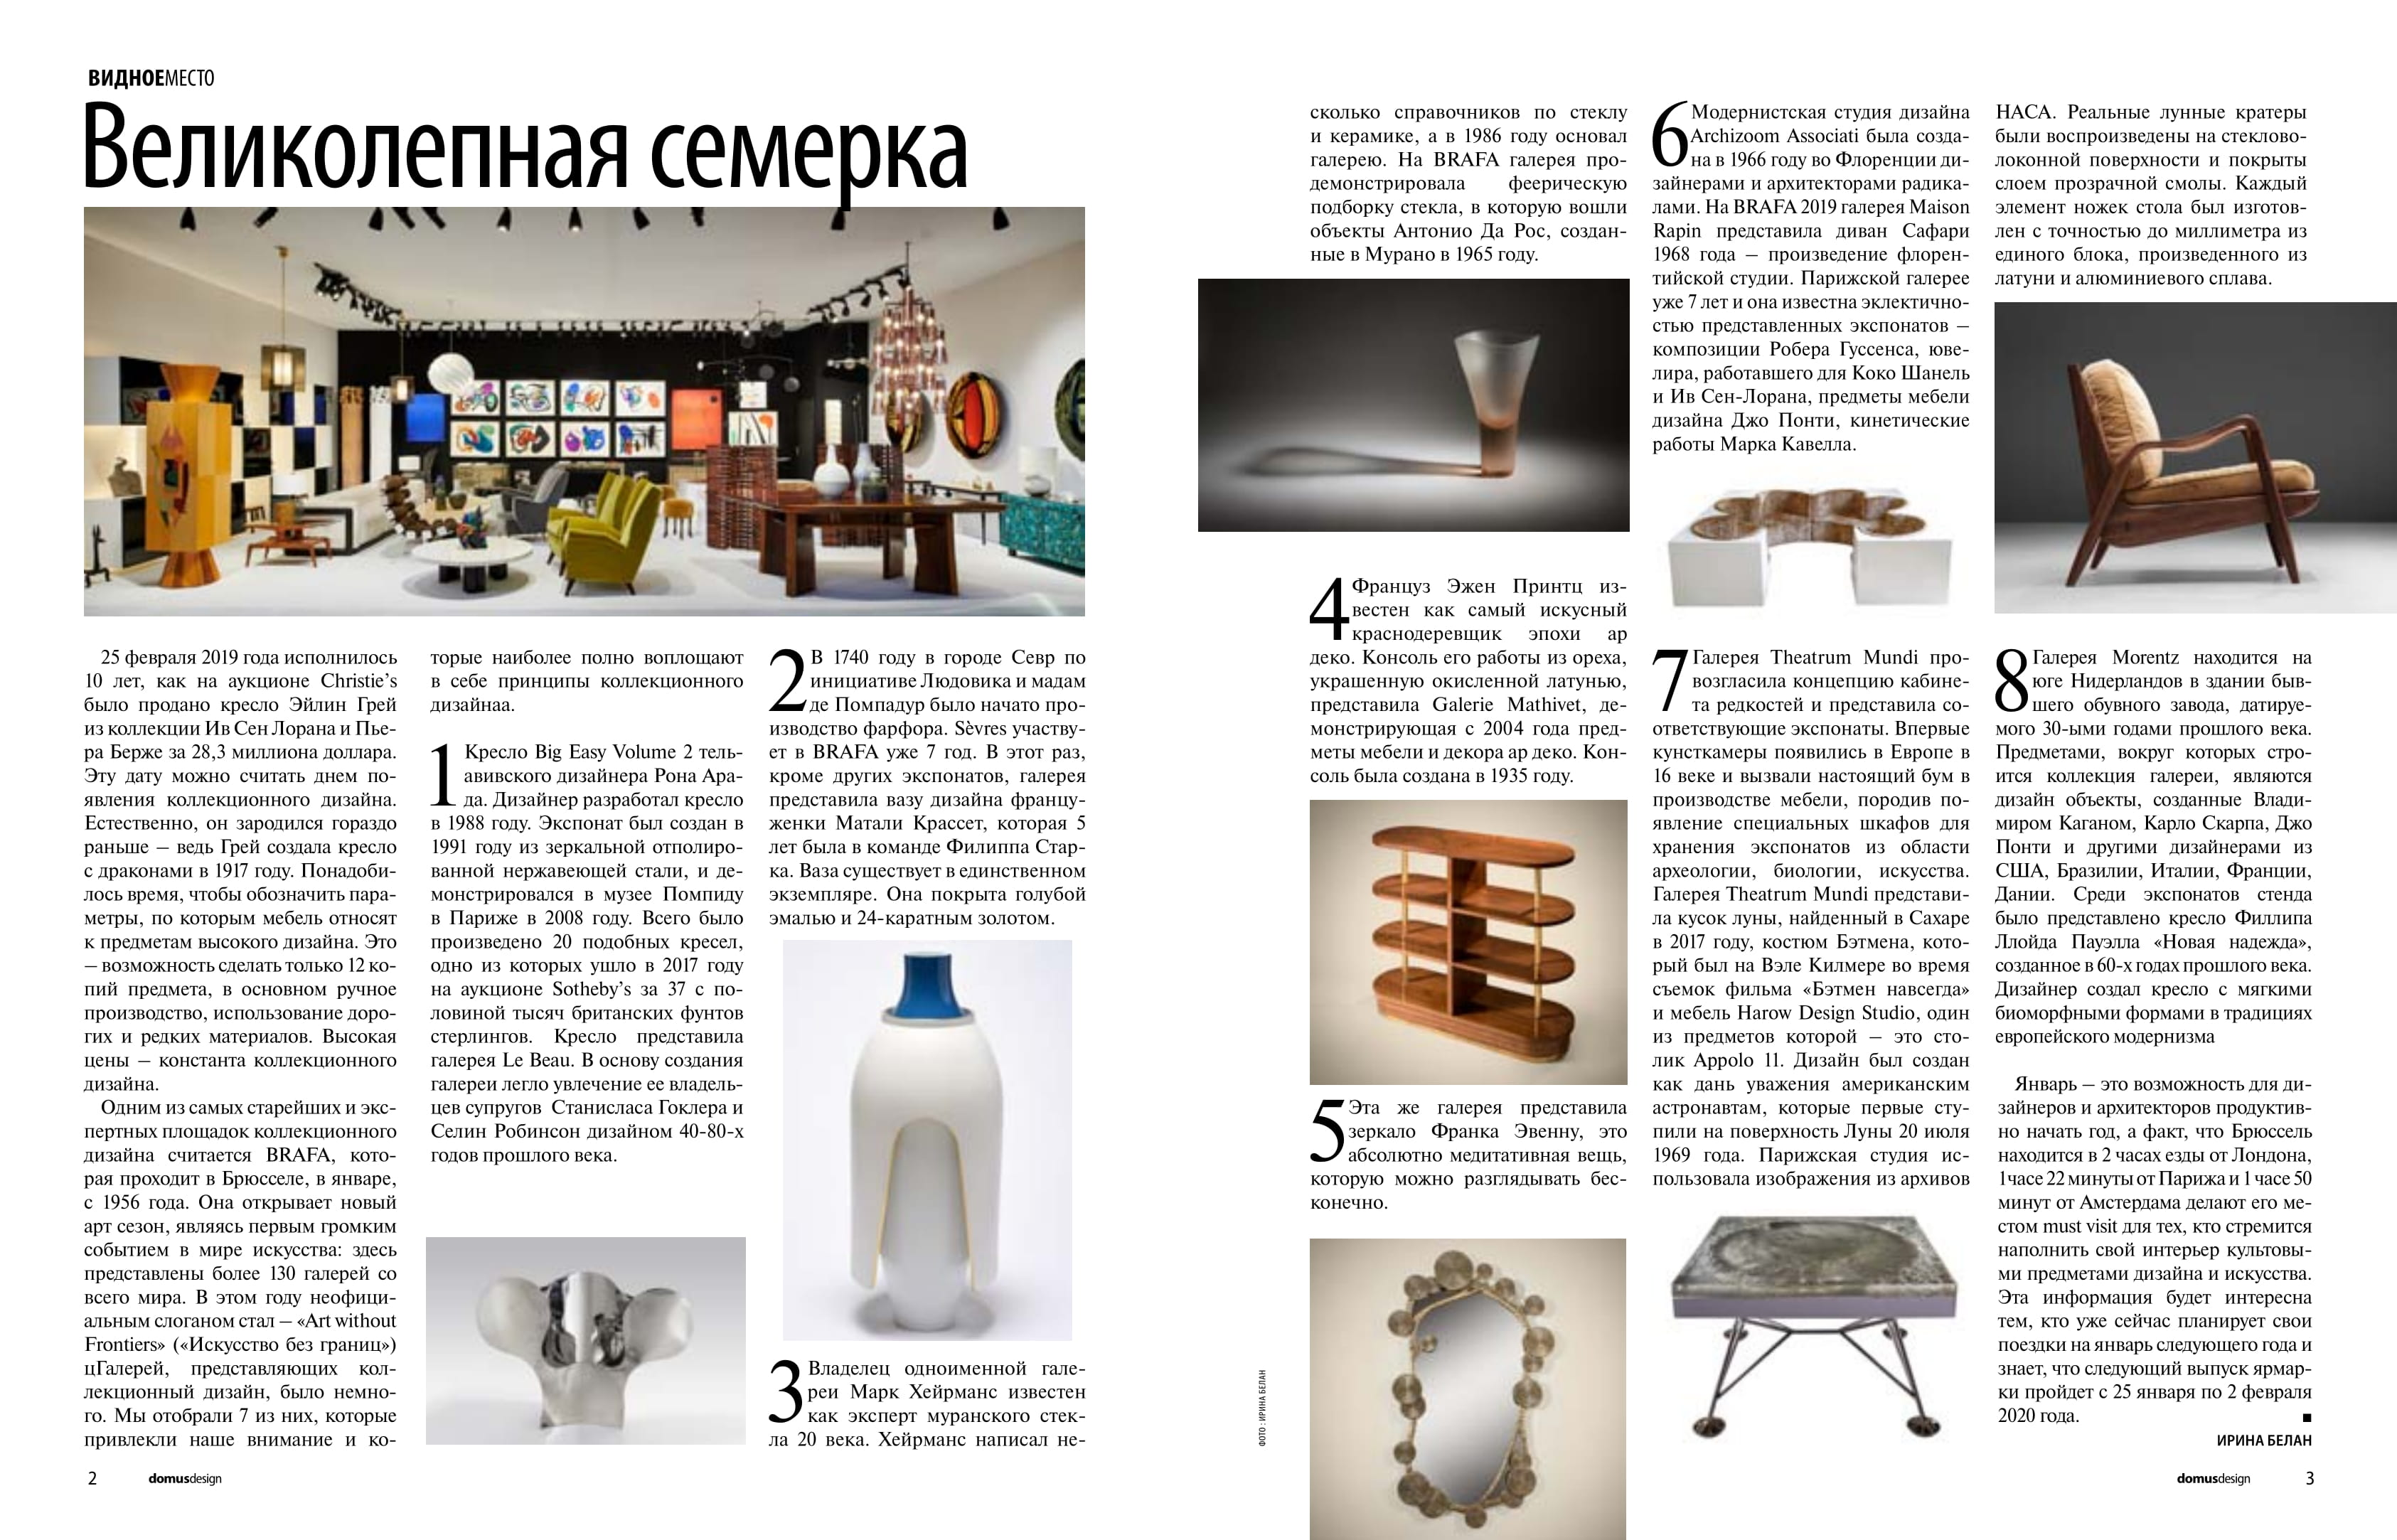 UKR_Domus magazine_04_05.2019_BRAFA report-2